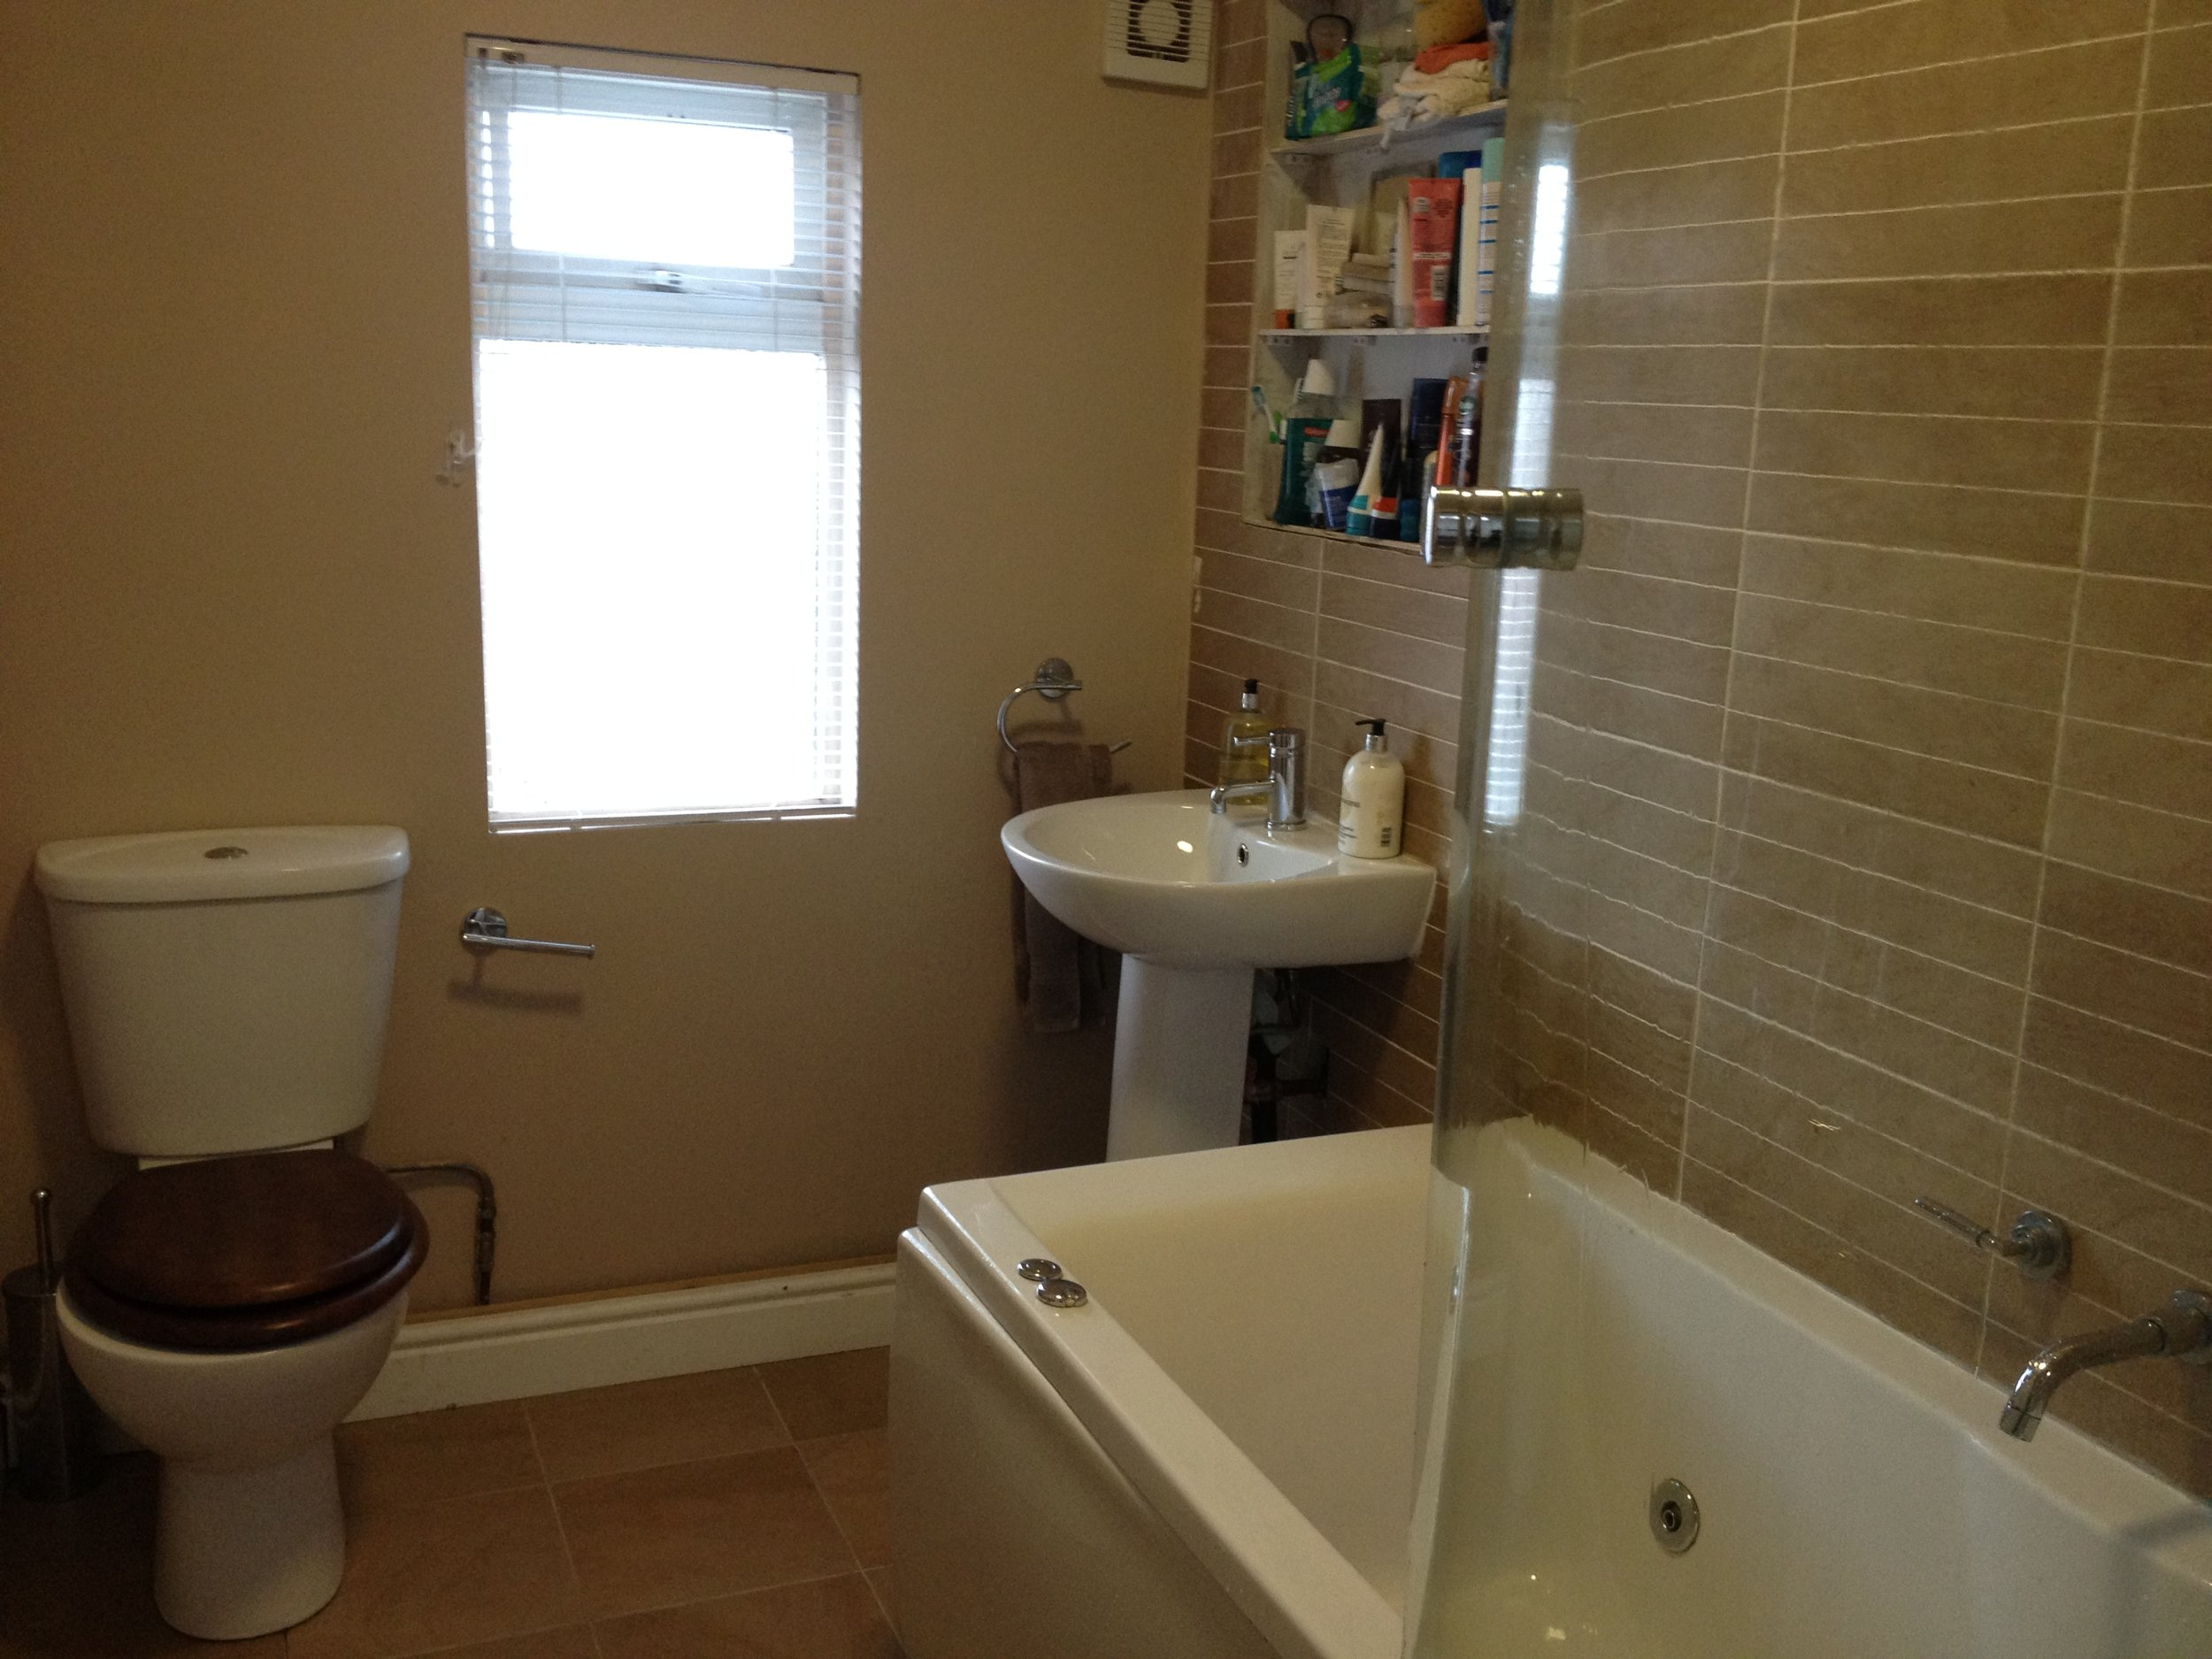 Modernisation, fitting& renovation of a bathroom - Including internal re-modelling